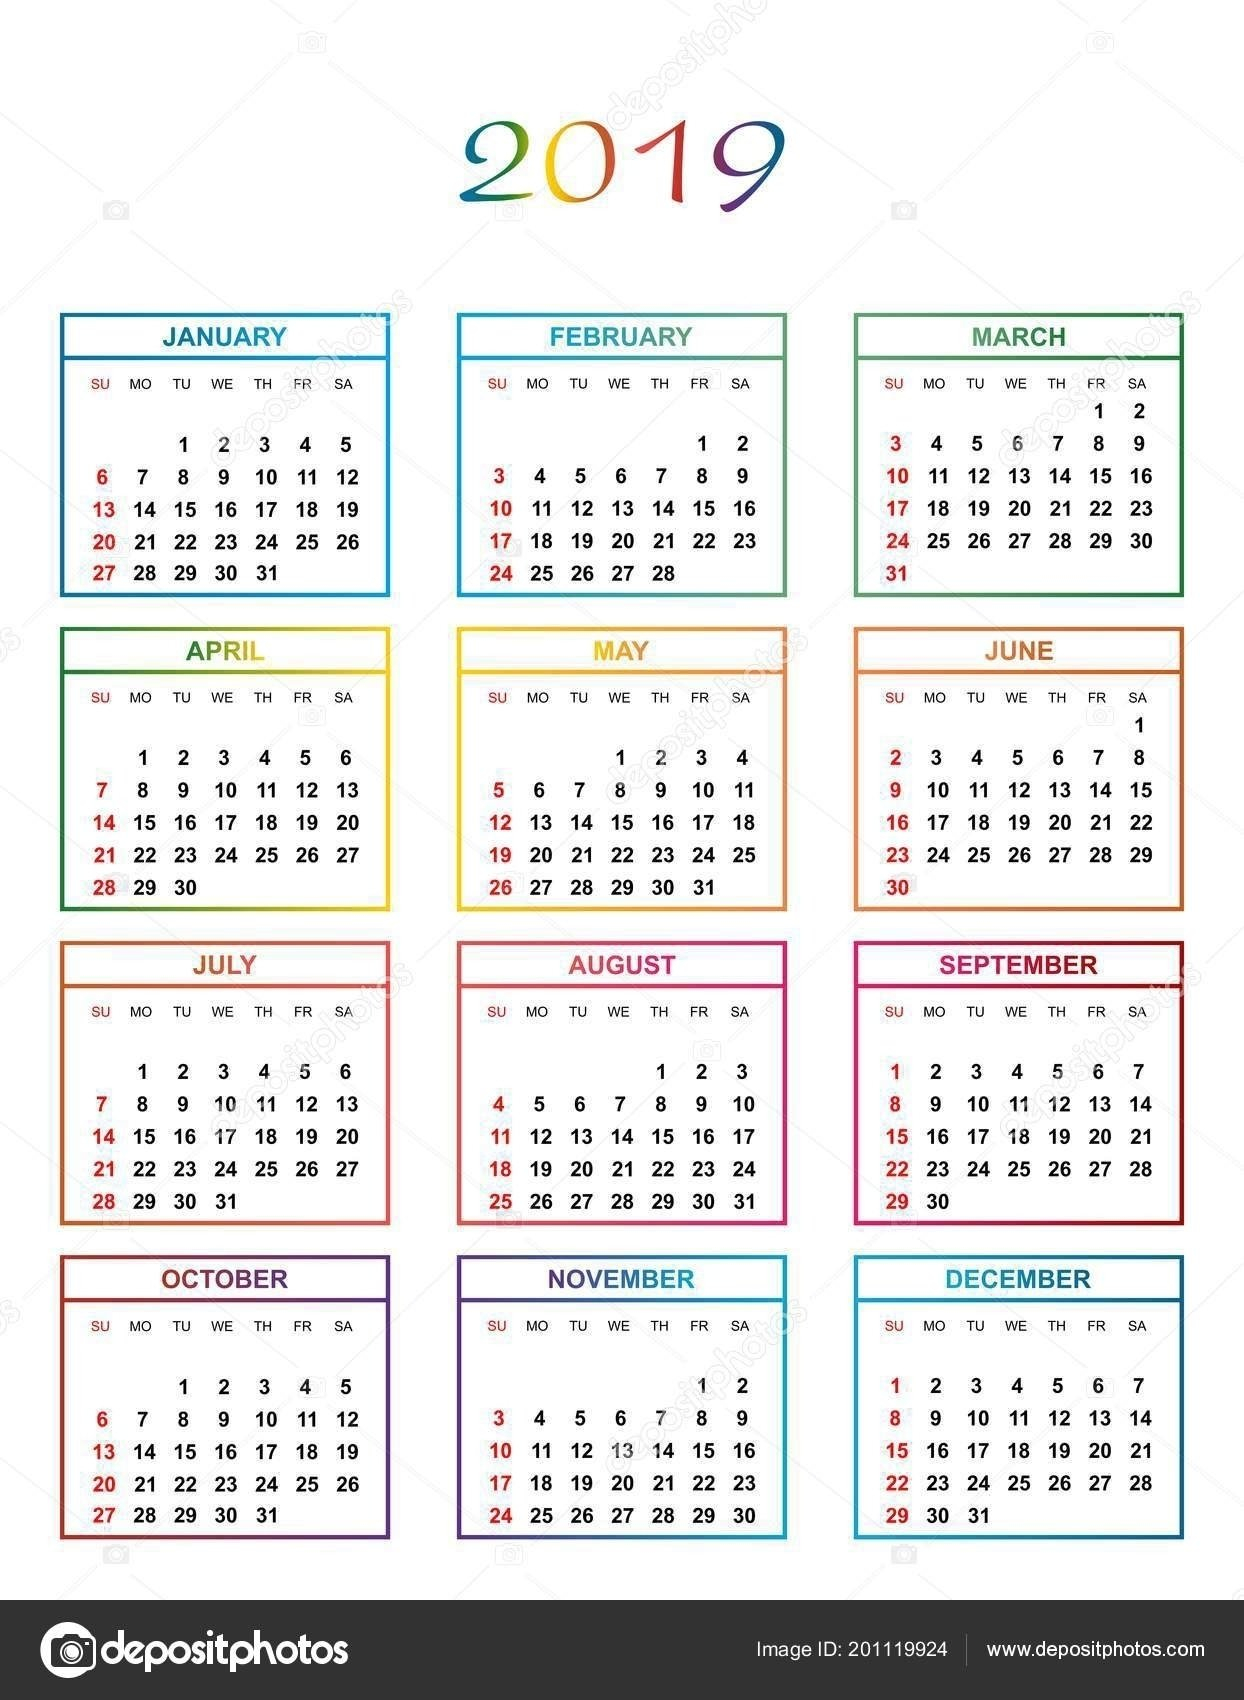 Calendar With 365 Days Numbered | Printable Calendar 365 Day Count Calendar